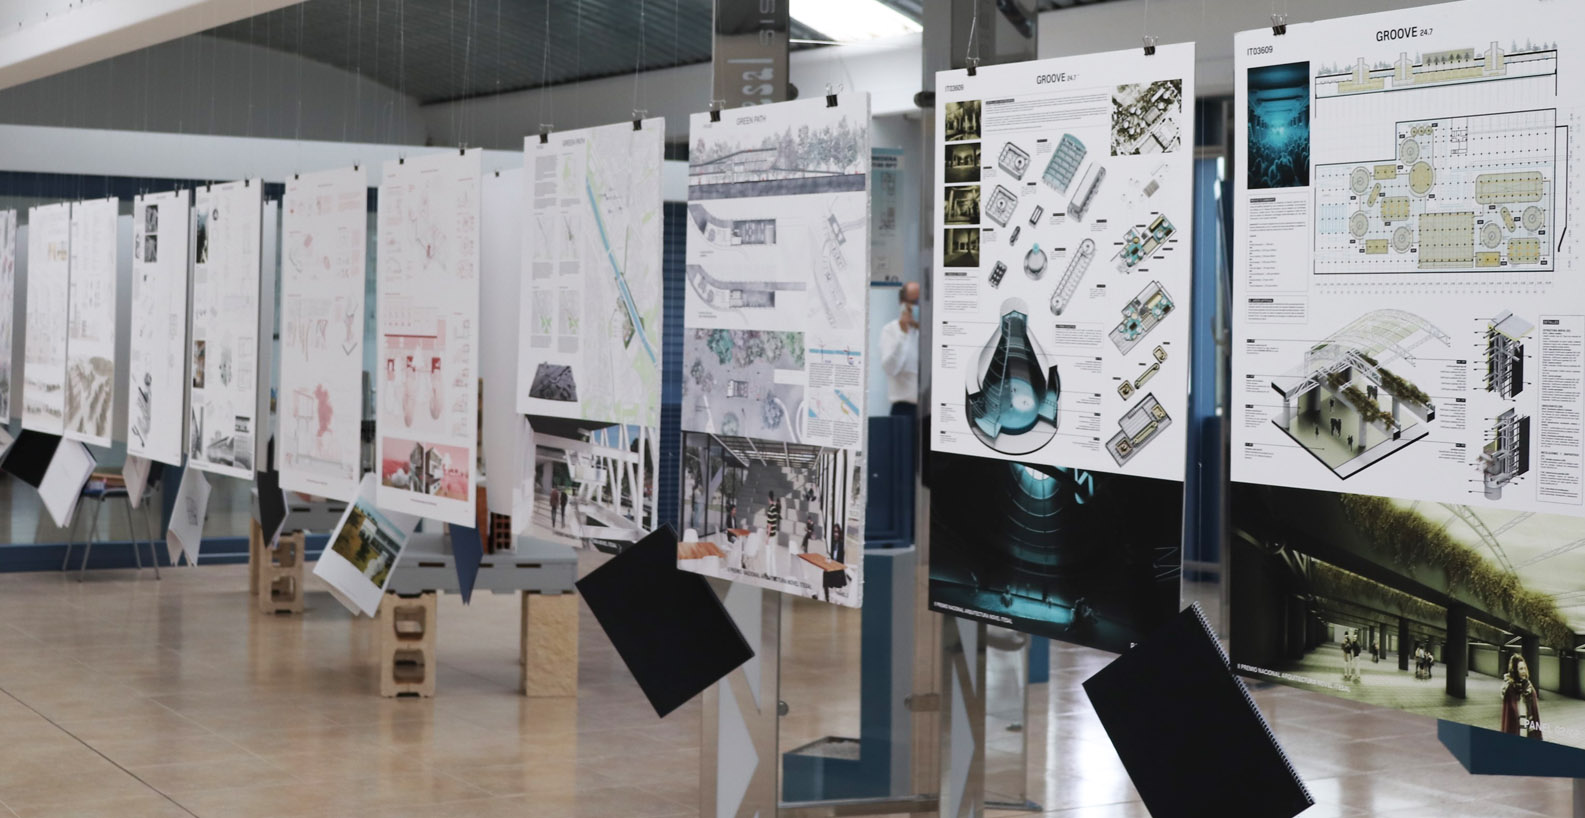 Comunicado oficial - Participantes y ganadores II Premio Nacional de Arquitectura Novel Itesal